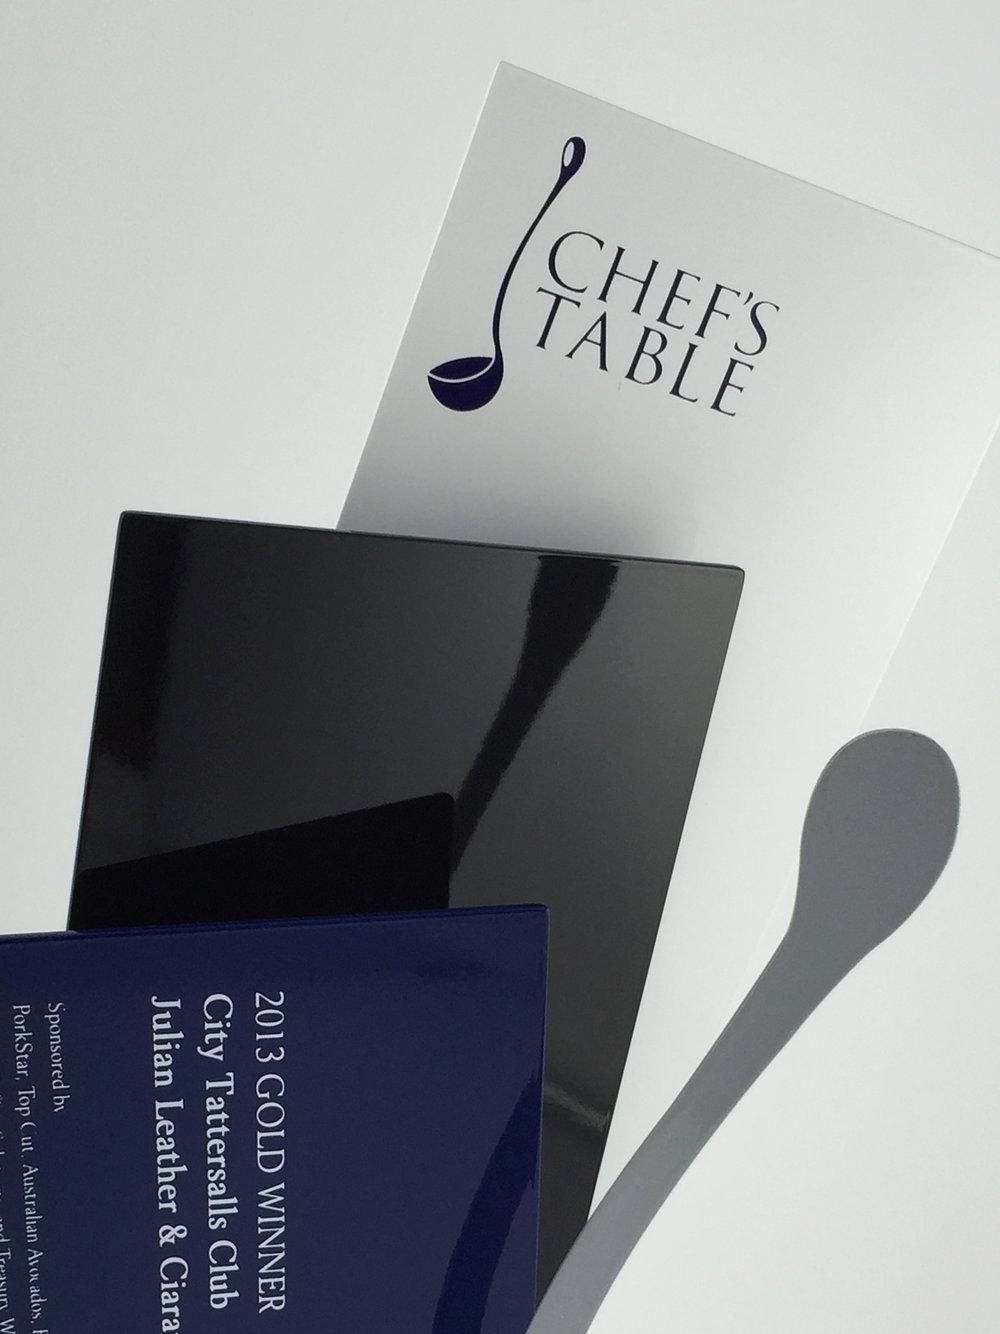 Chefs-table-aluminium-trohpy-award-04.jpg